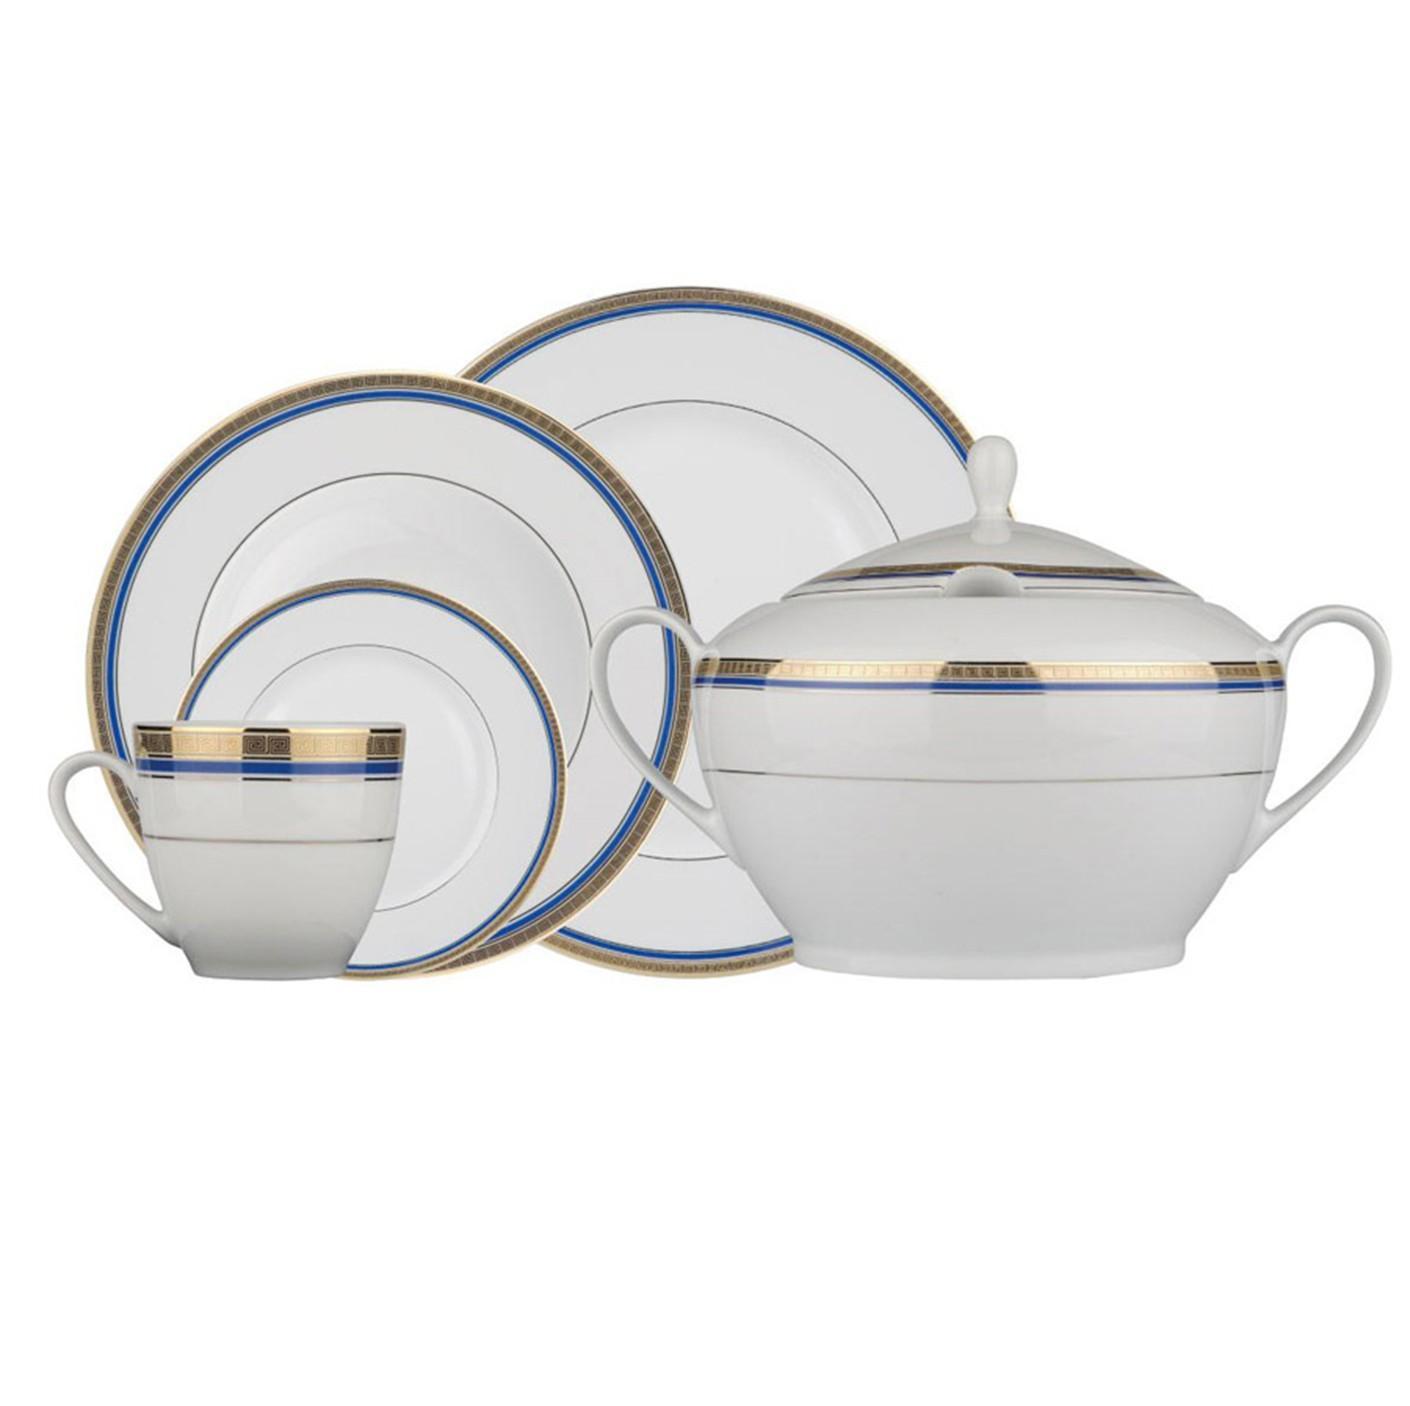 Kutahya Porselen FINE BONE Patterned 82 Pieces 8516 Dinnerware Set